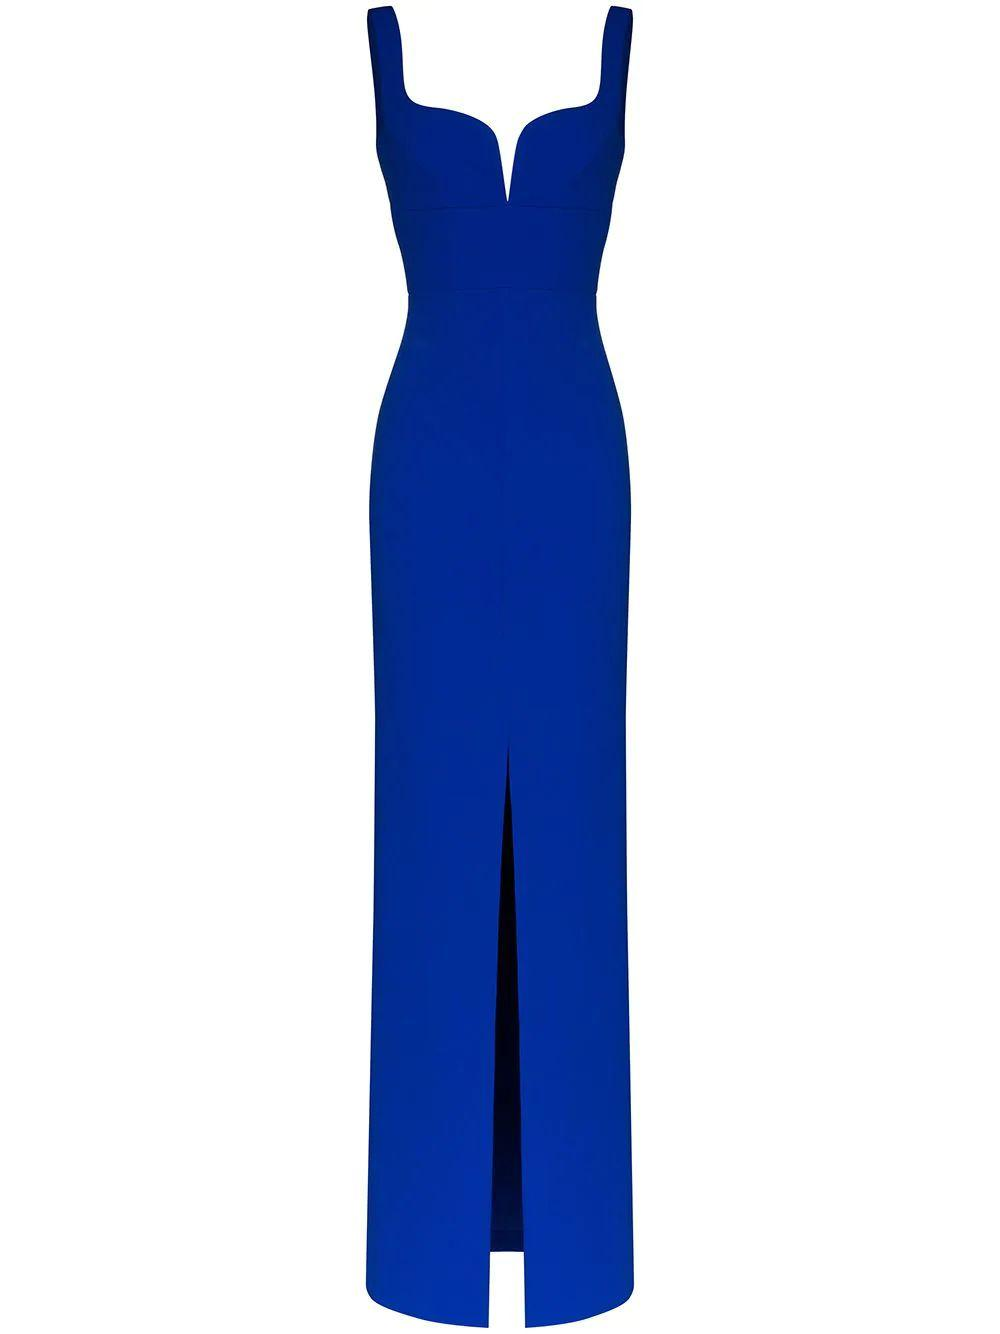 Linza Maxi Dress Item # OS25047